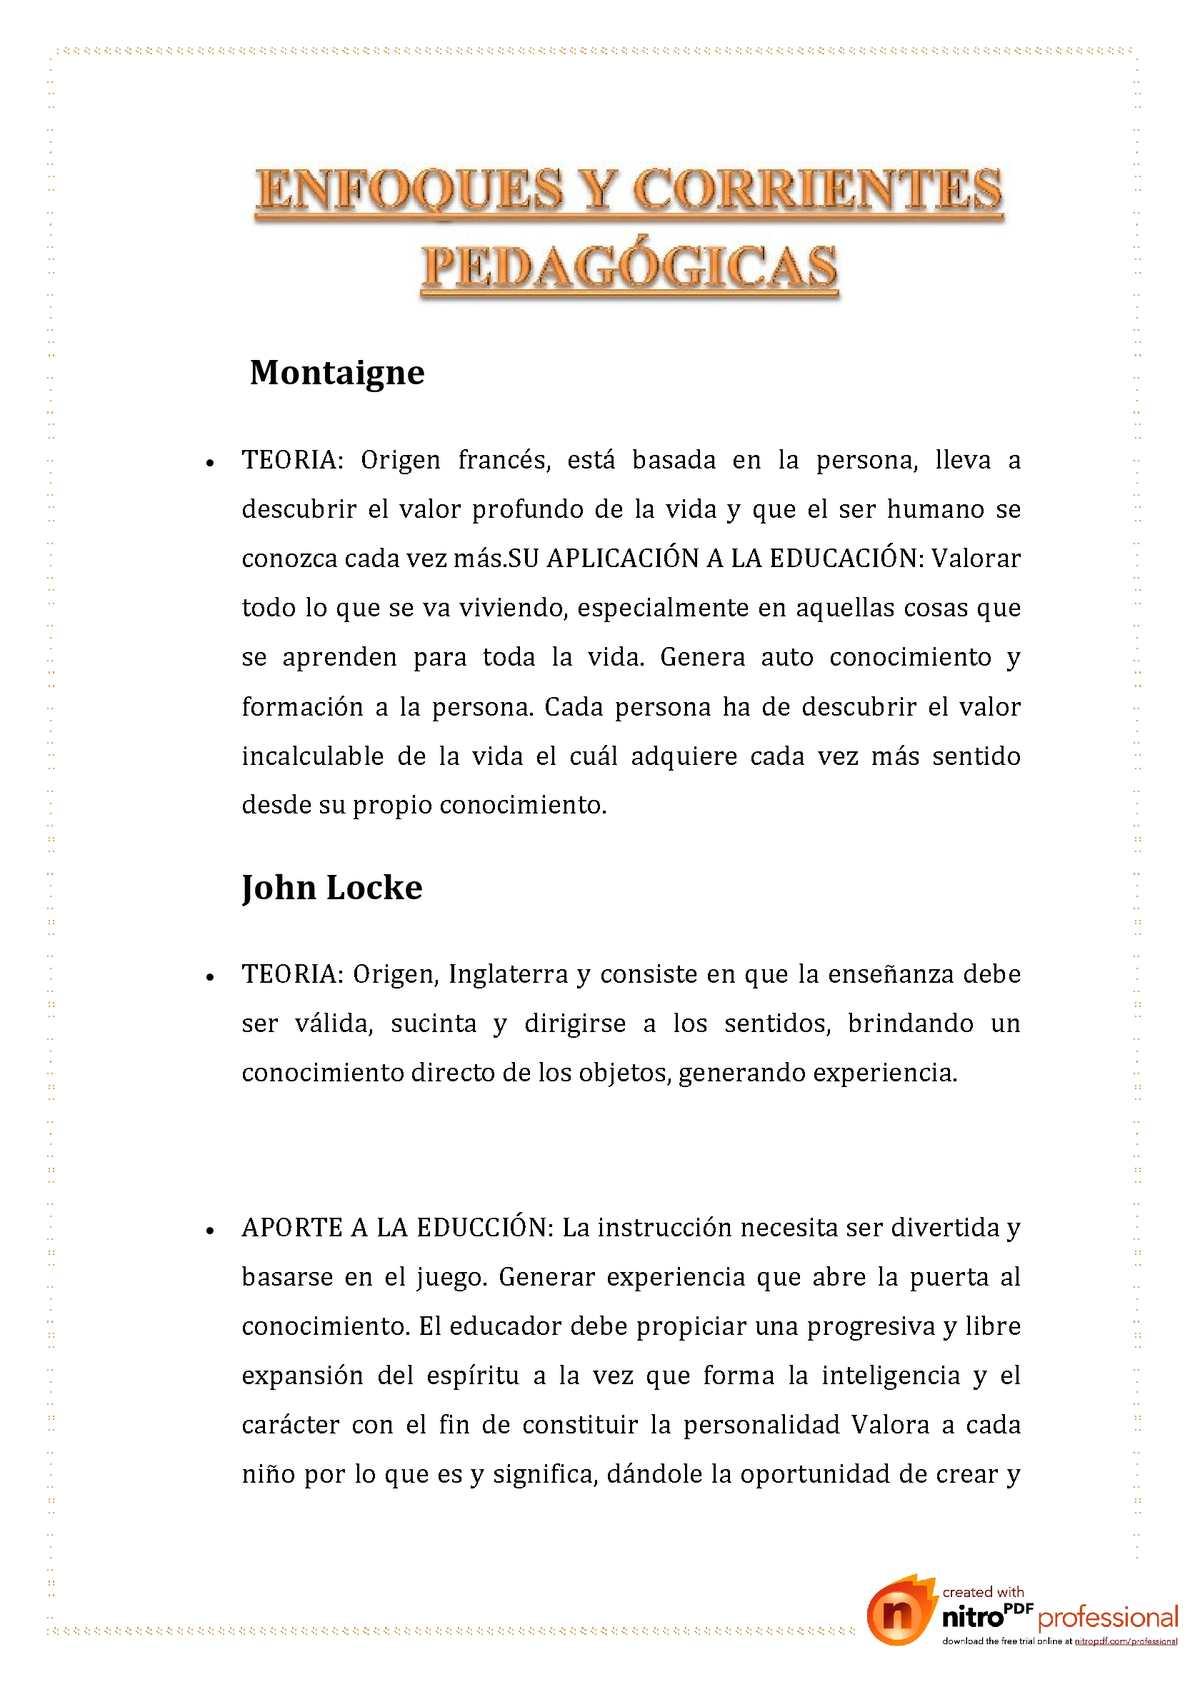 corrientes pedagogicas 3- Irma Valdizan Tacuche